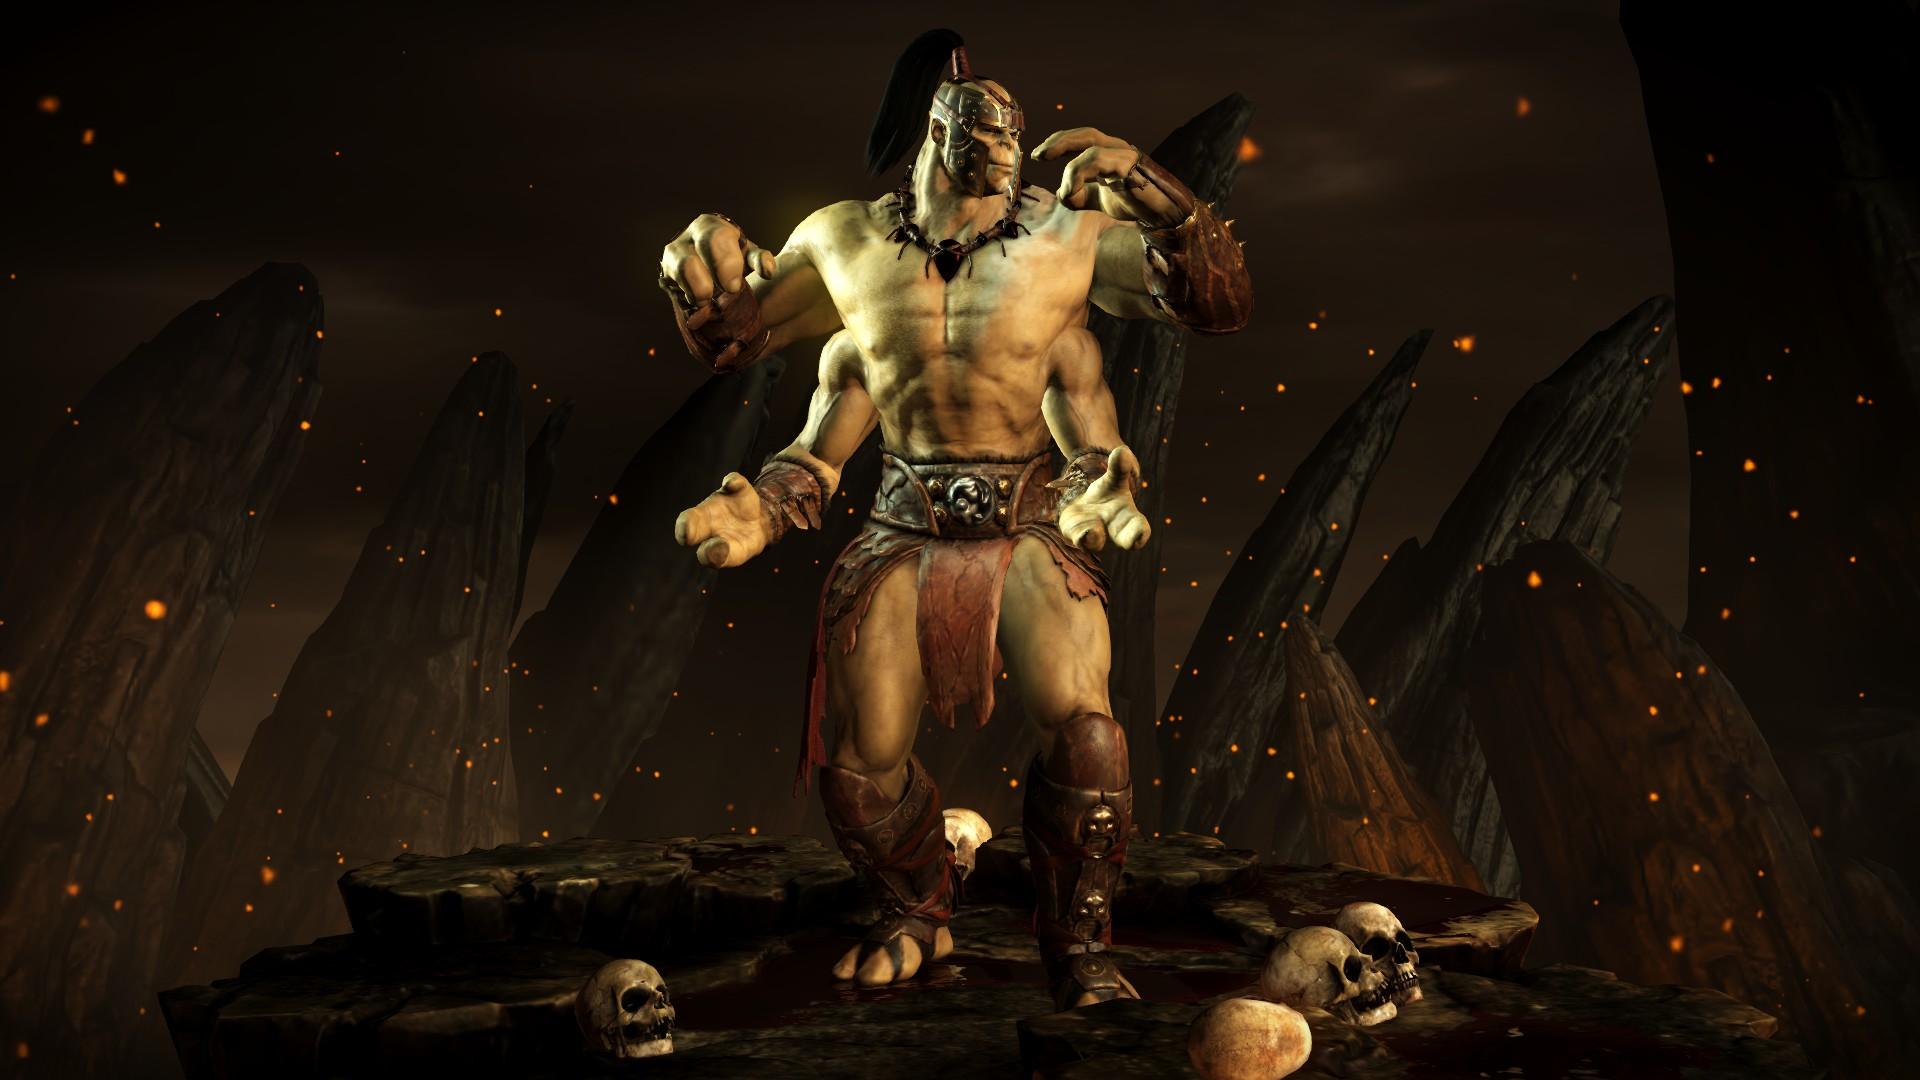 Горо (Стиль: Куатанский воин) - Mortal Kombat X Горо